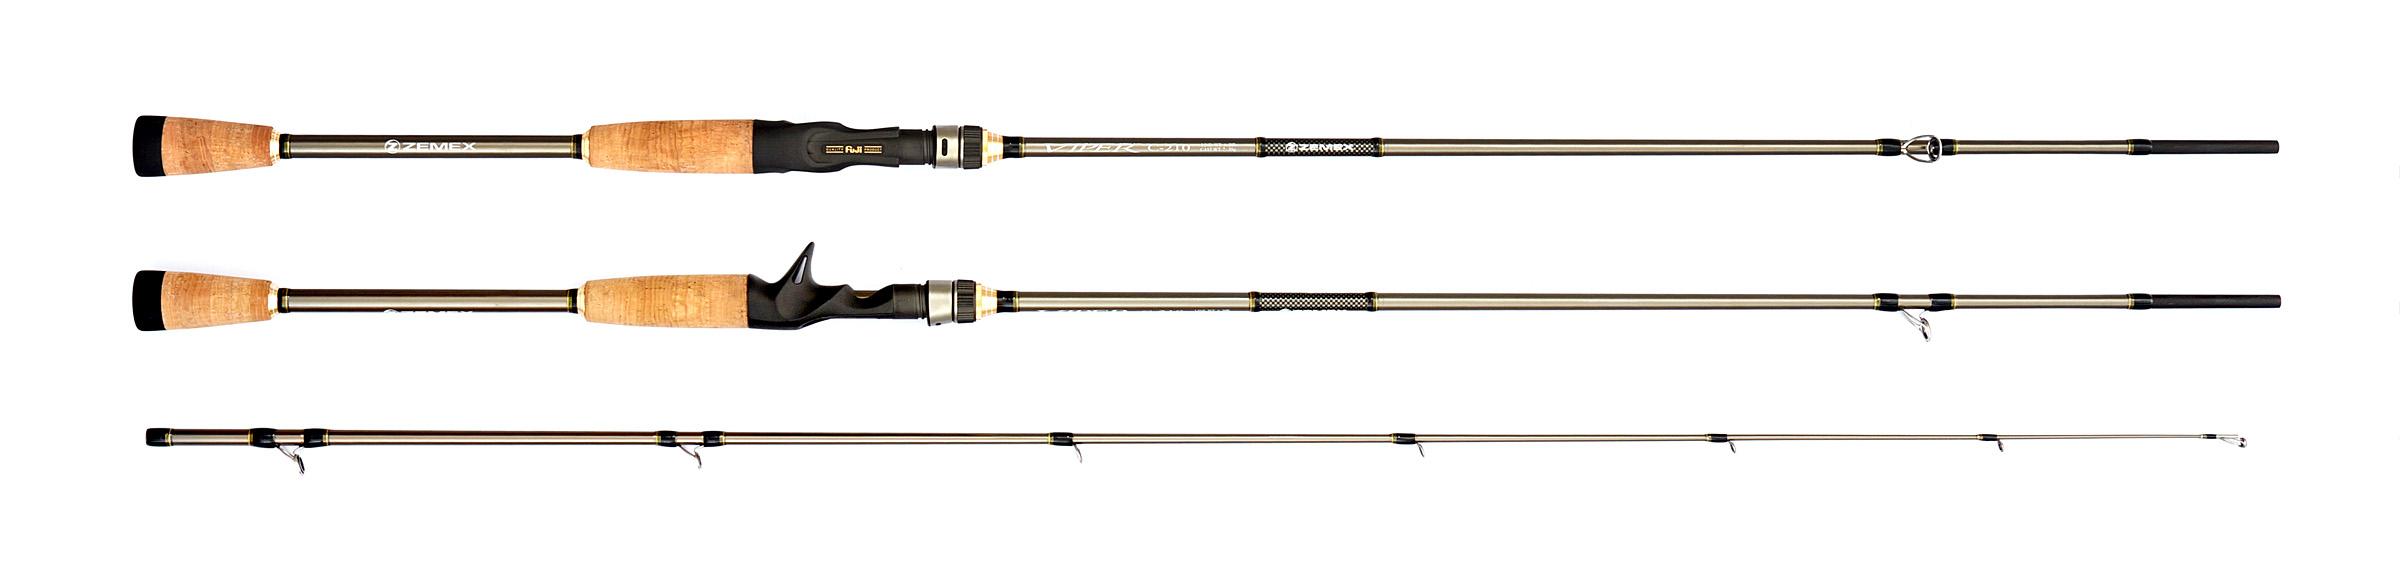 Спиннинг Zemex Viper C 2,10м 7-35гр